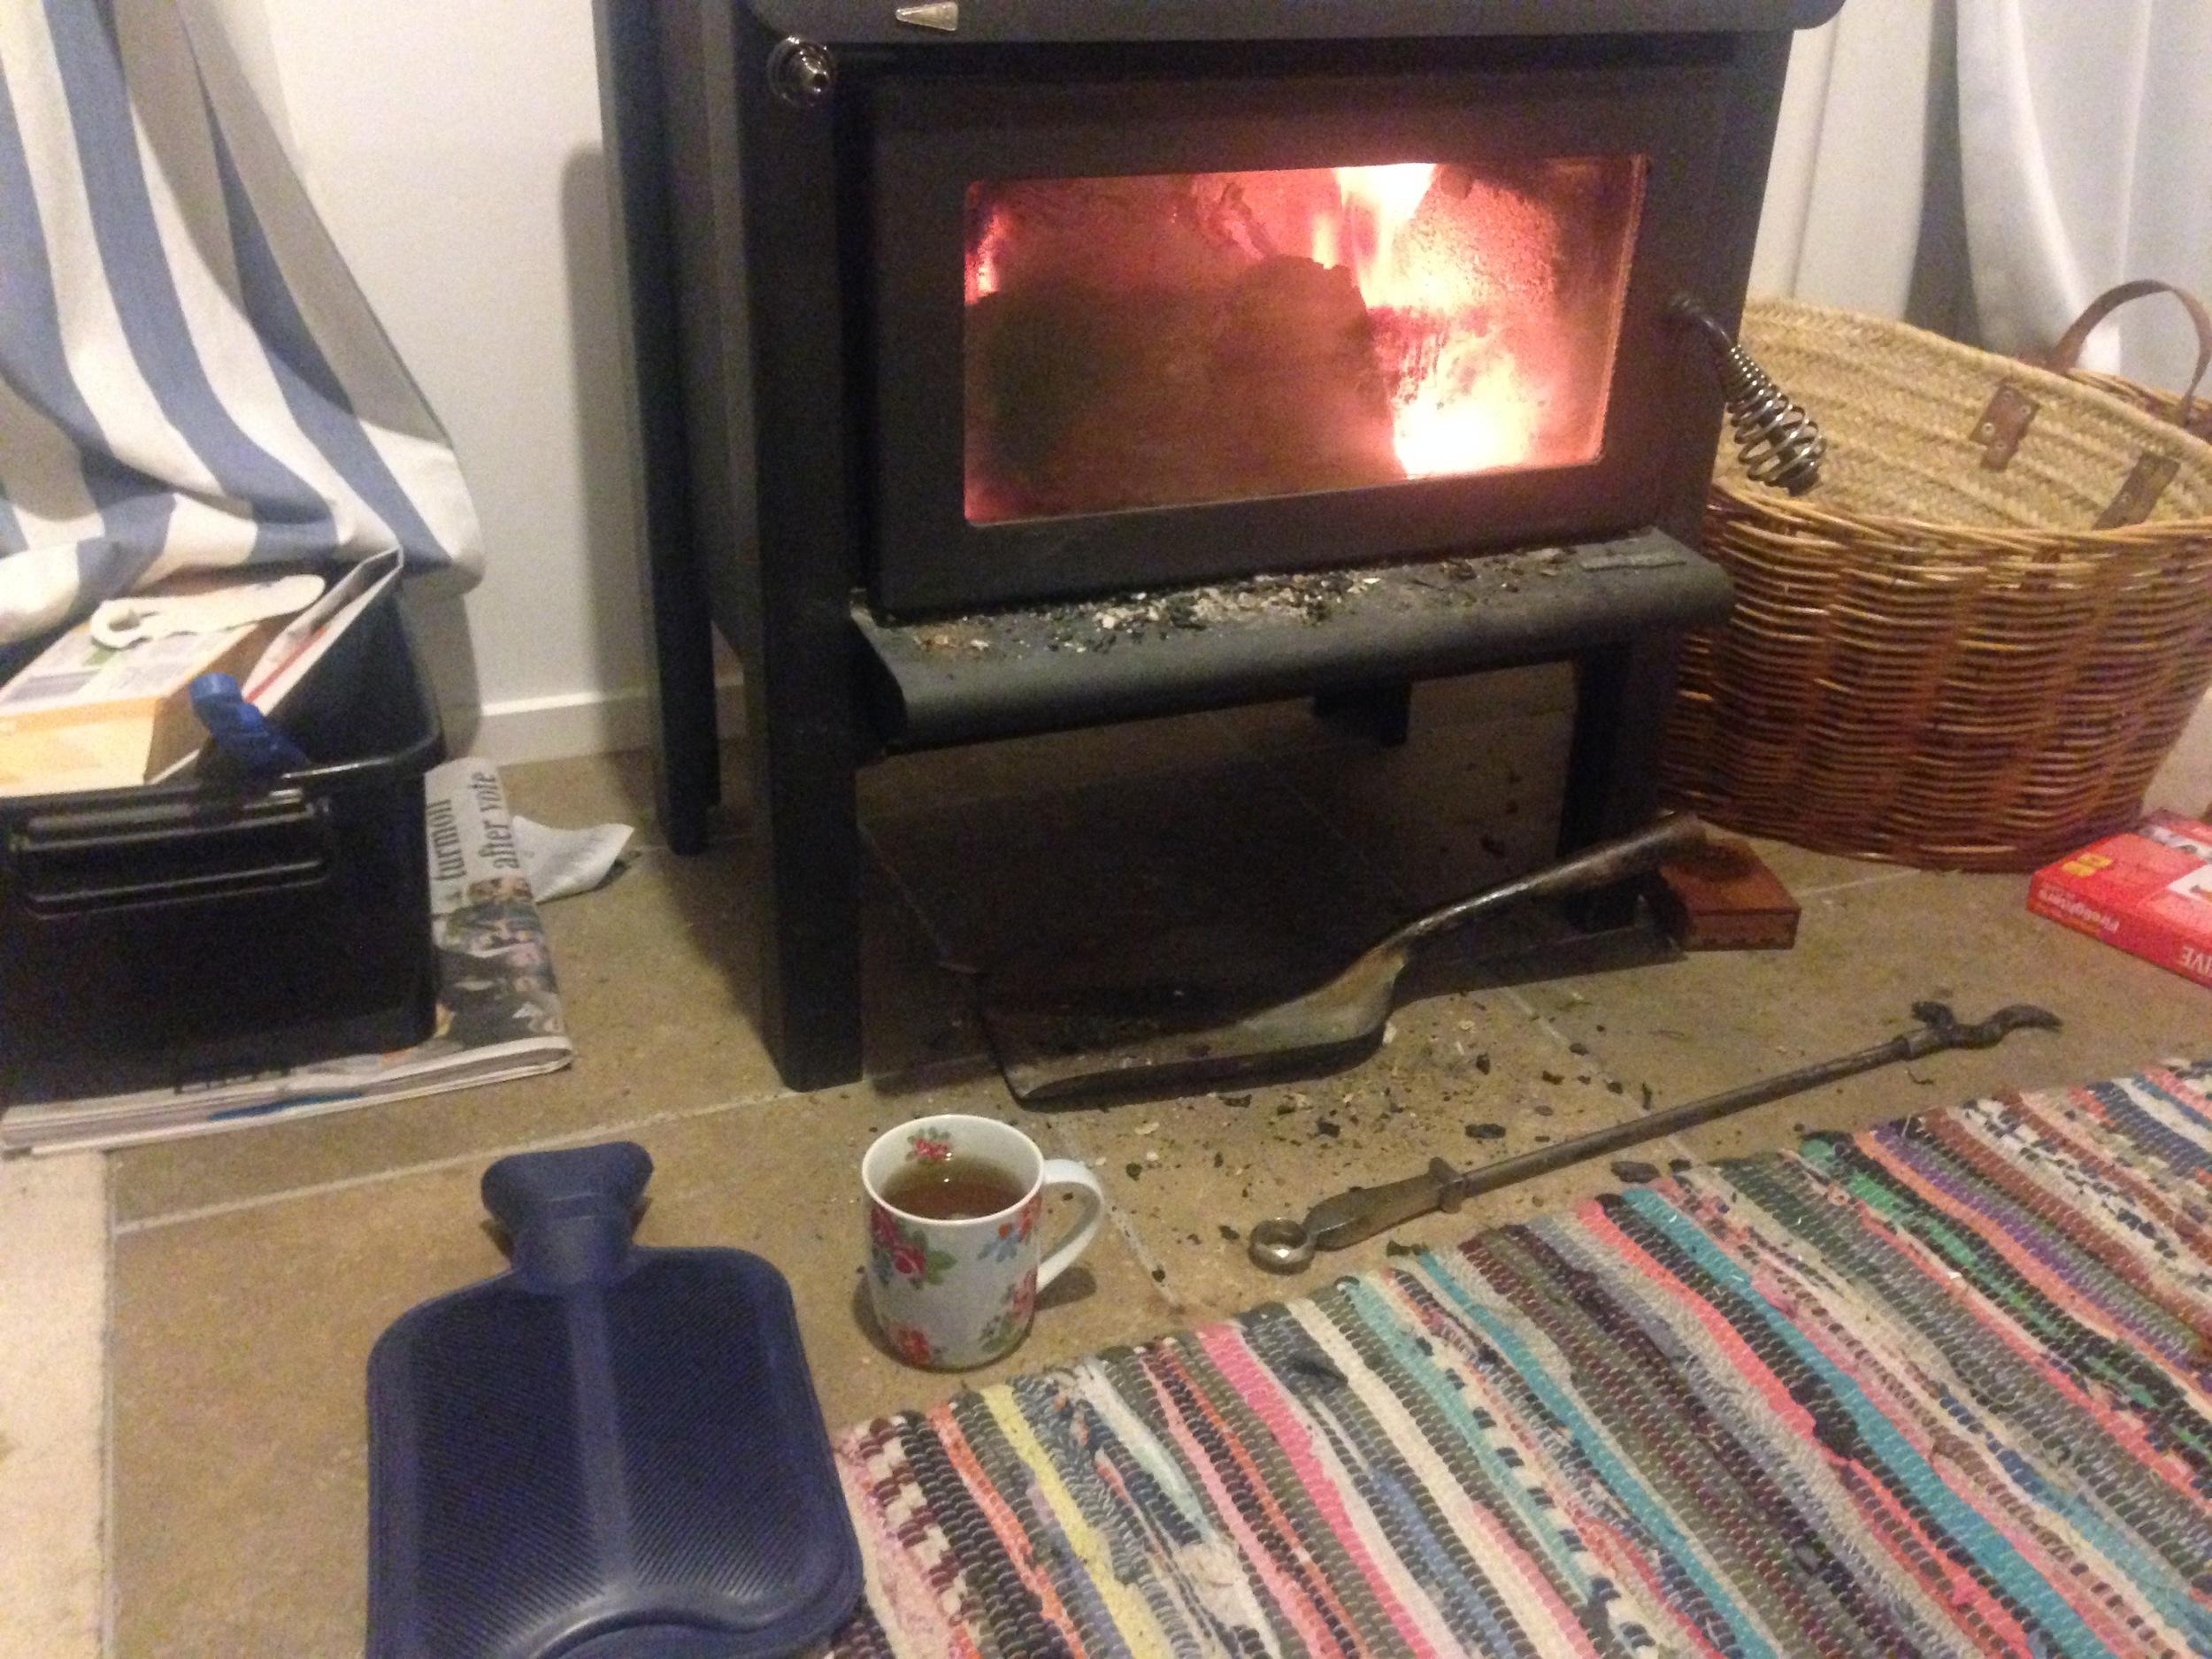 New Zealand winter starter kit: Hot water bottle, cup of tea, wood burning stove.